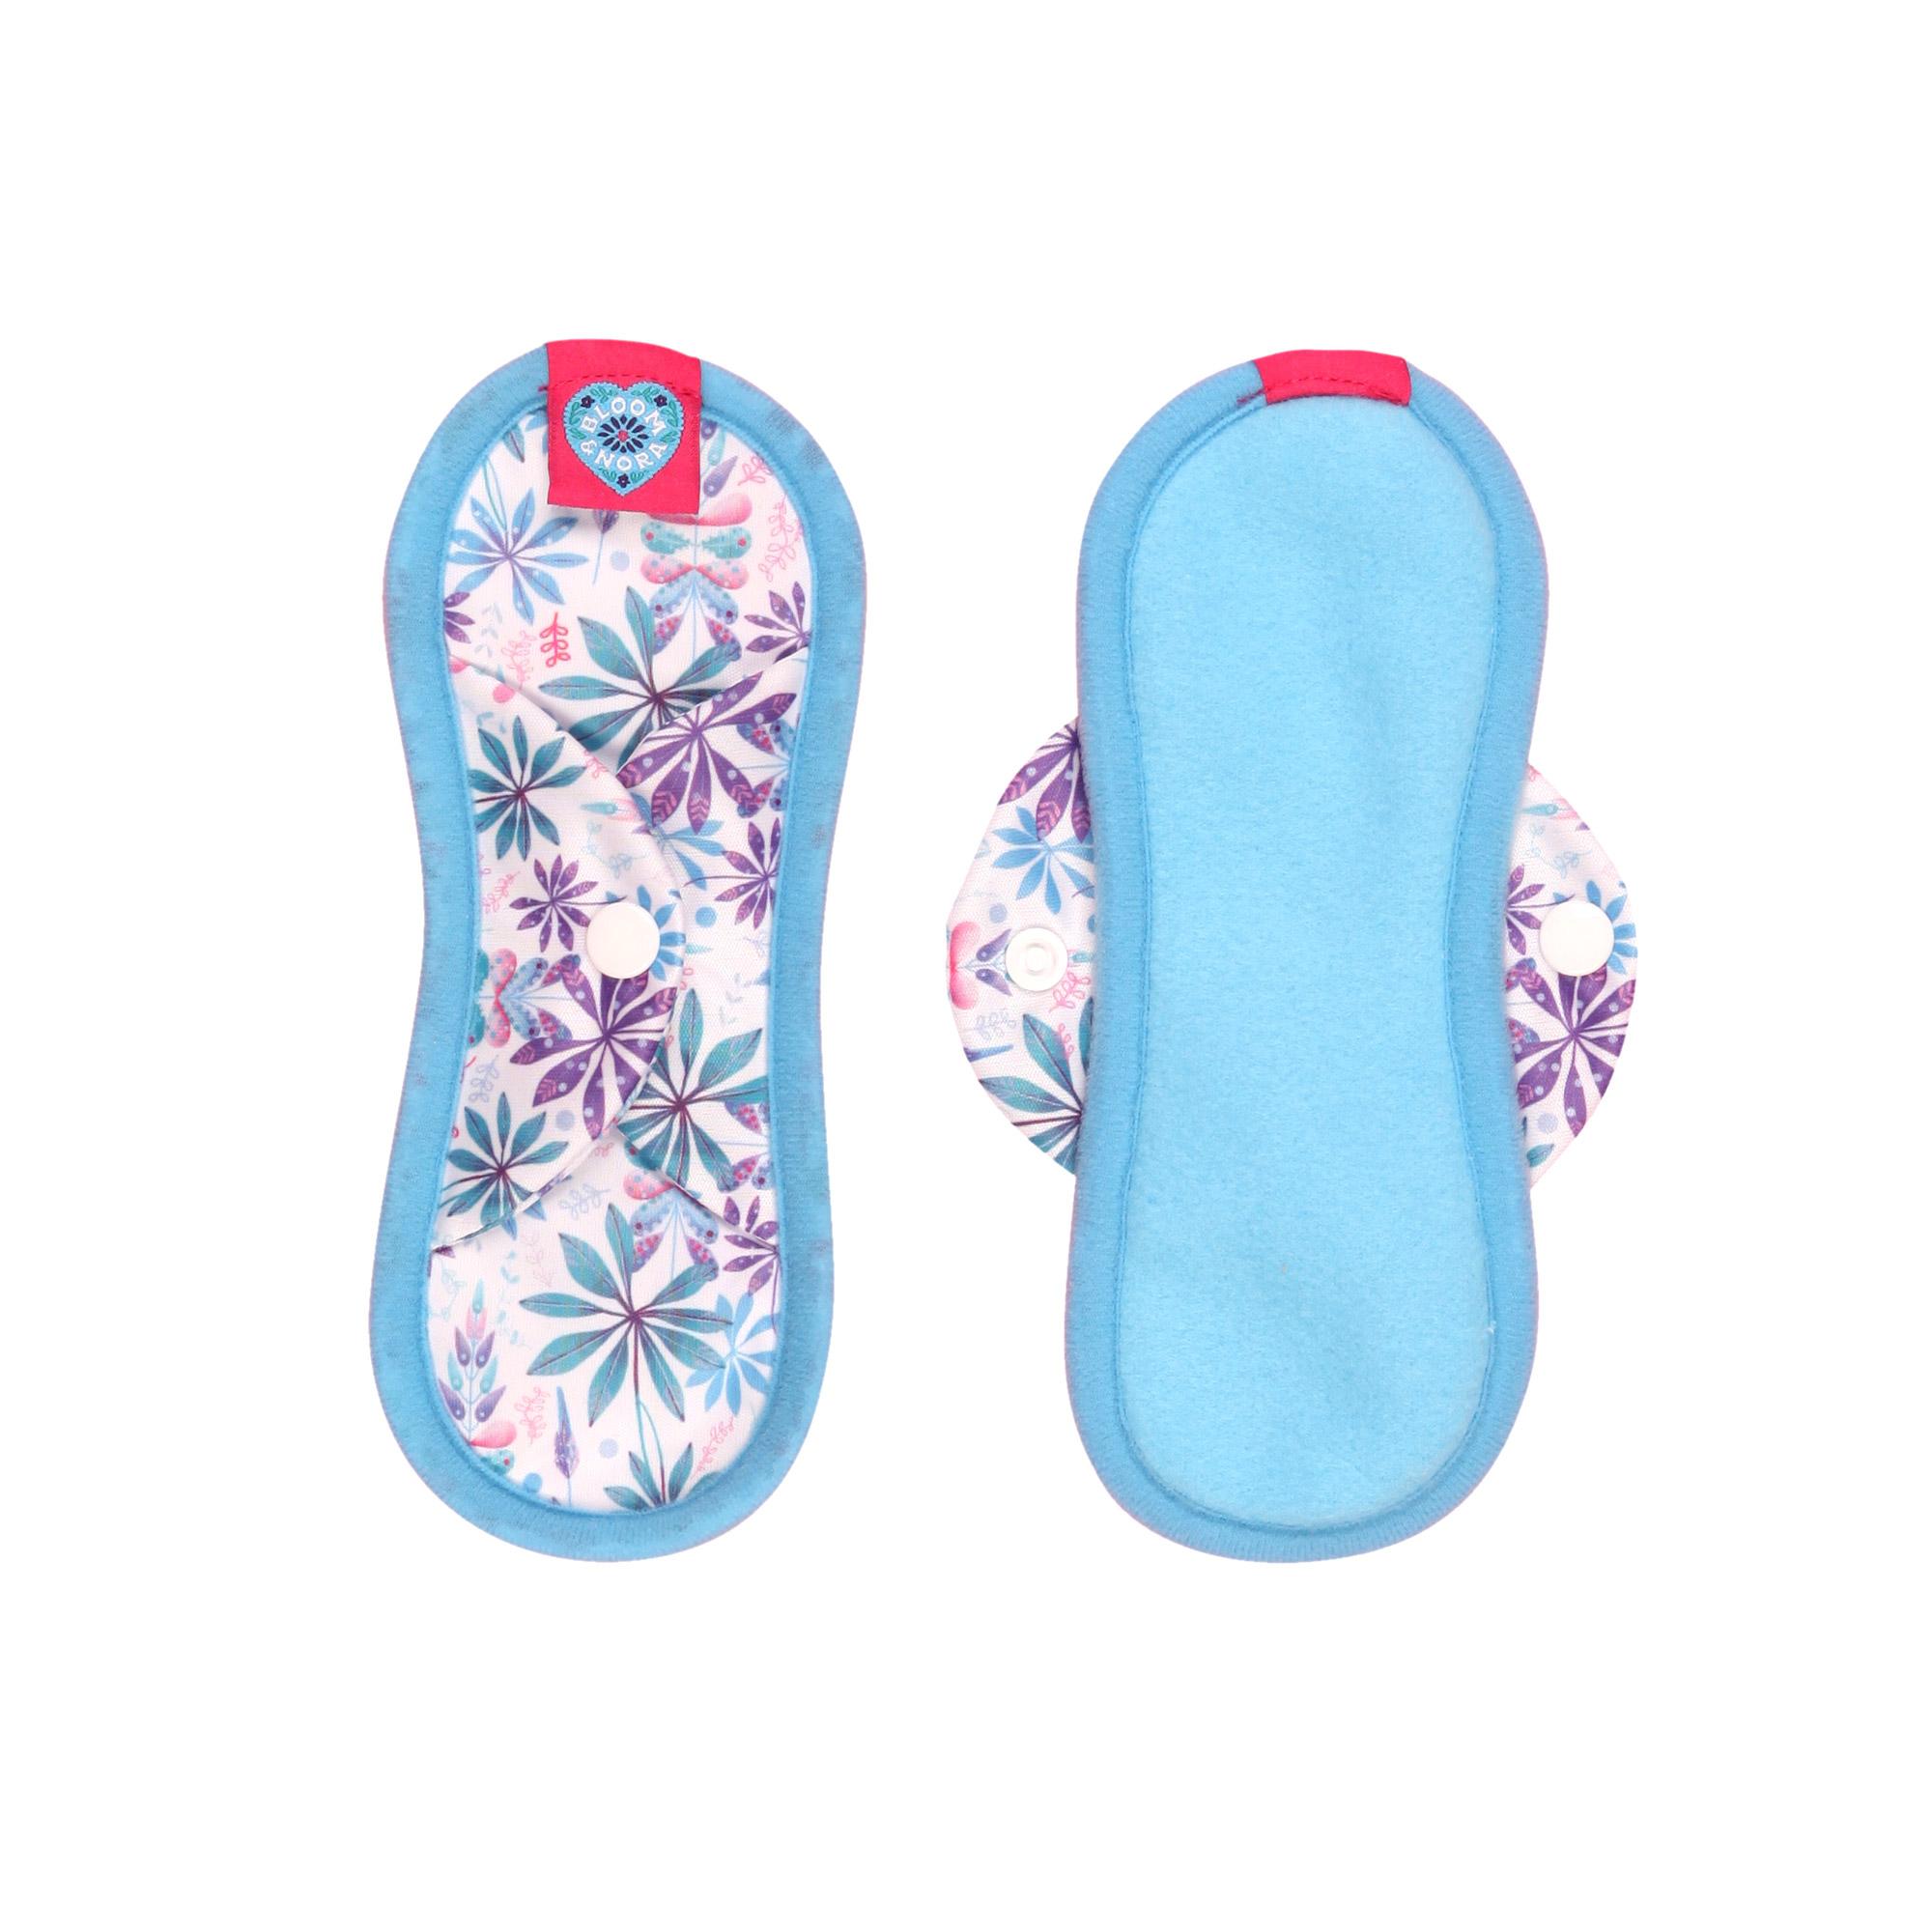 Mini Sanitary Towel - Bloom and Nora